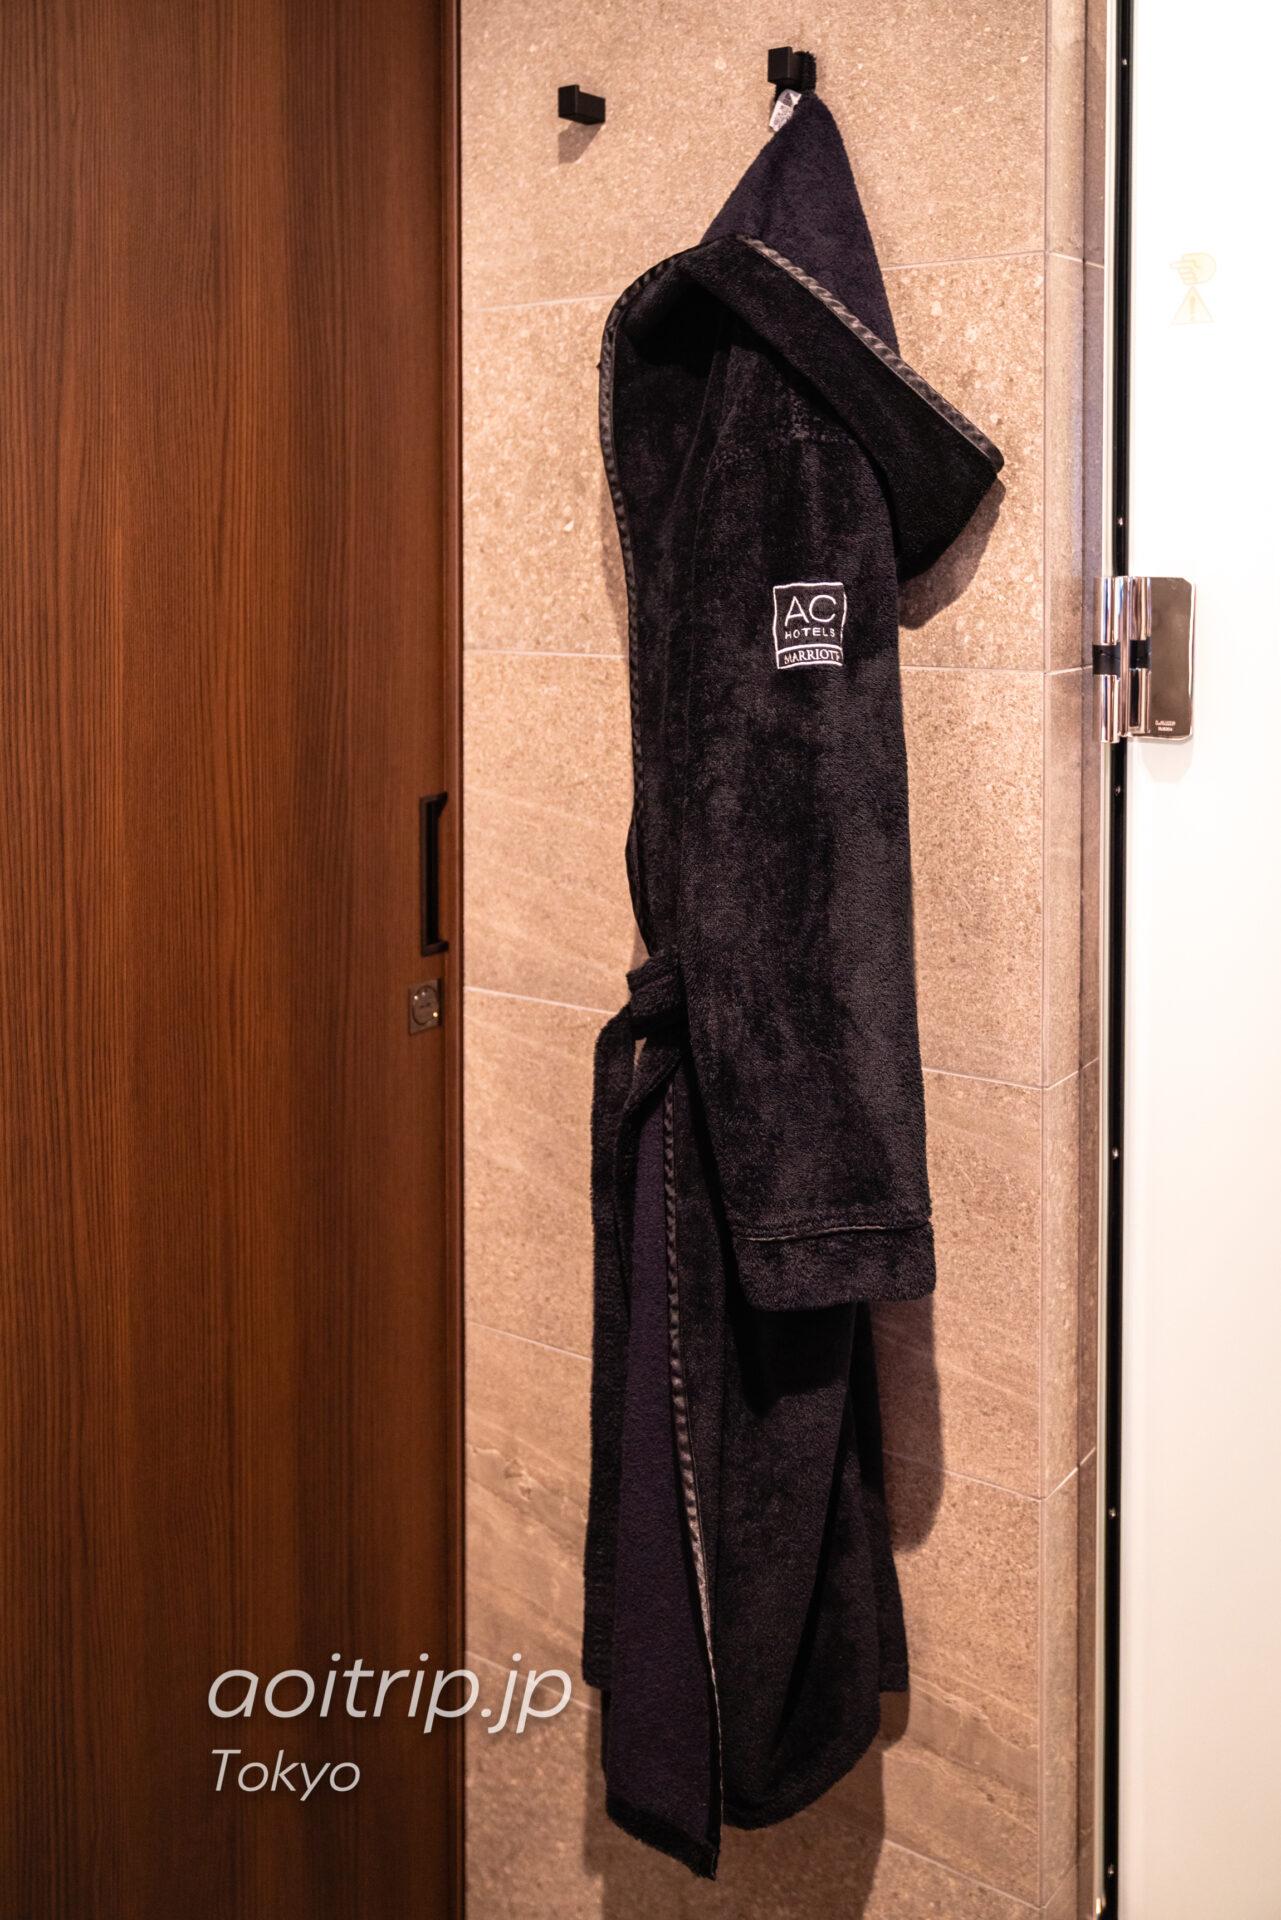 ACホテル東京銀座の黒いバスローブ